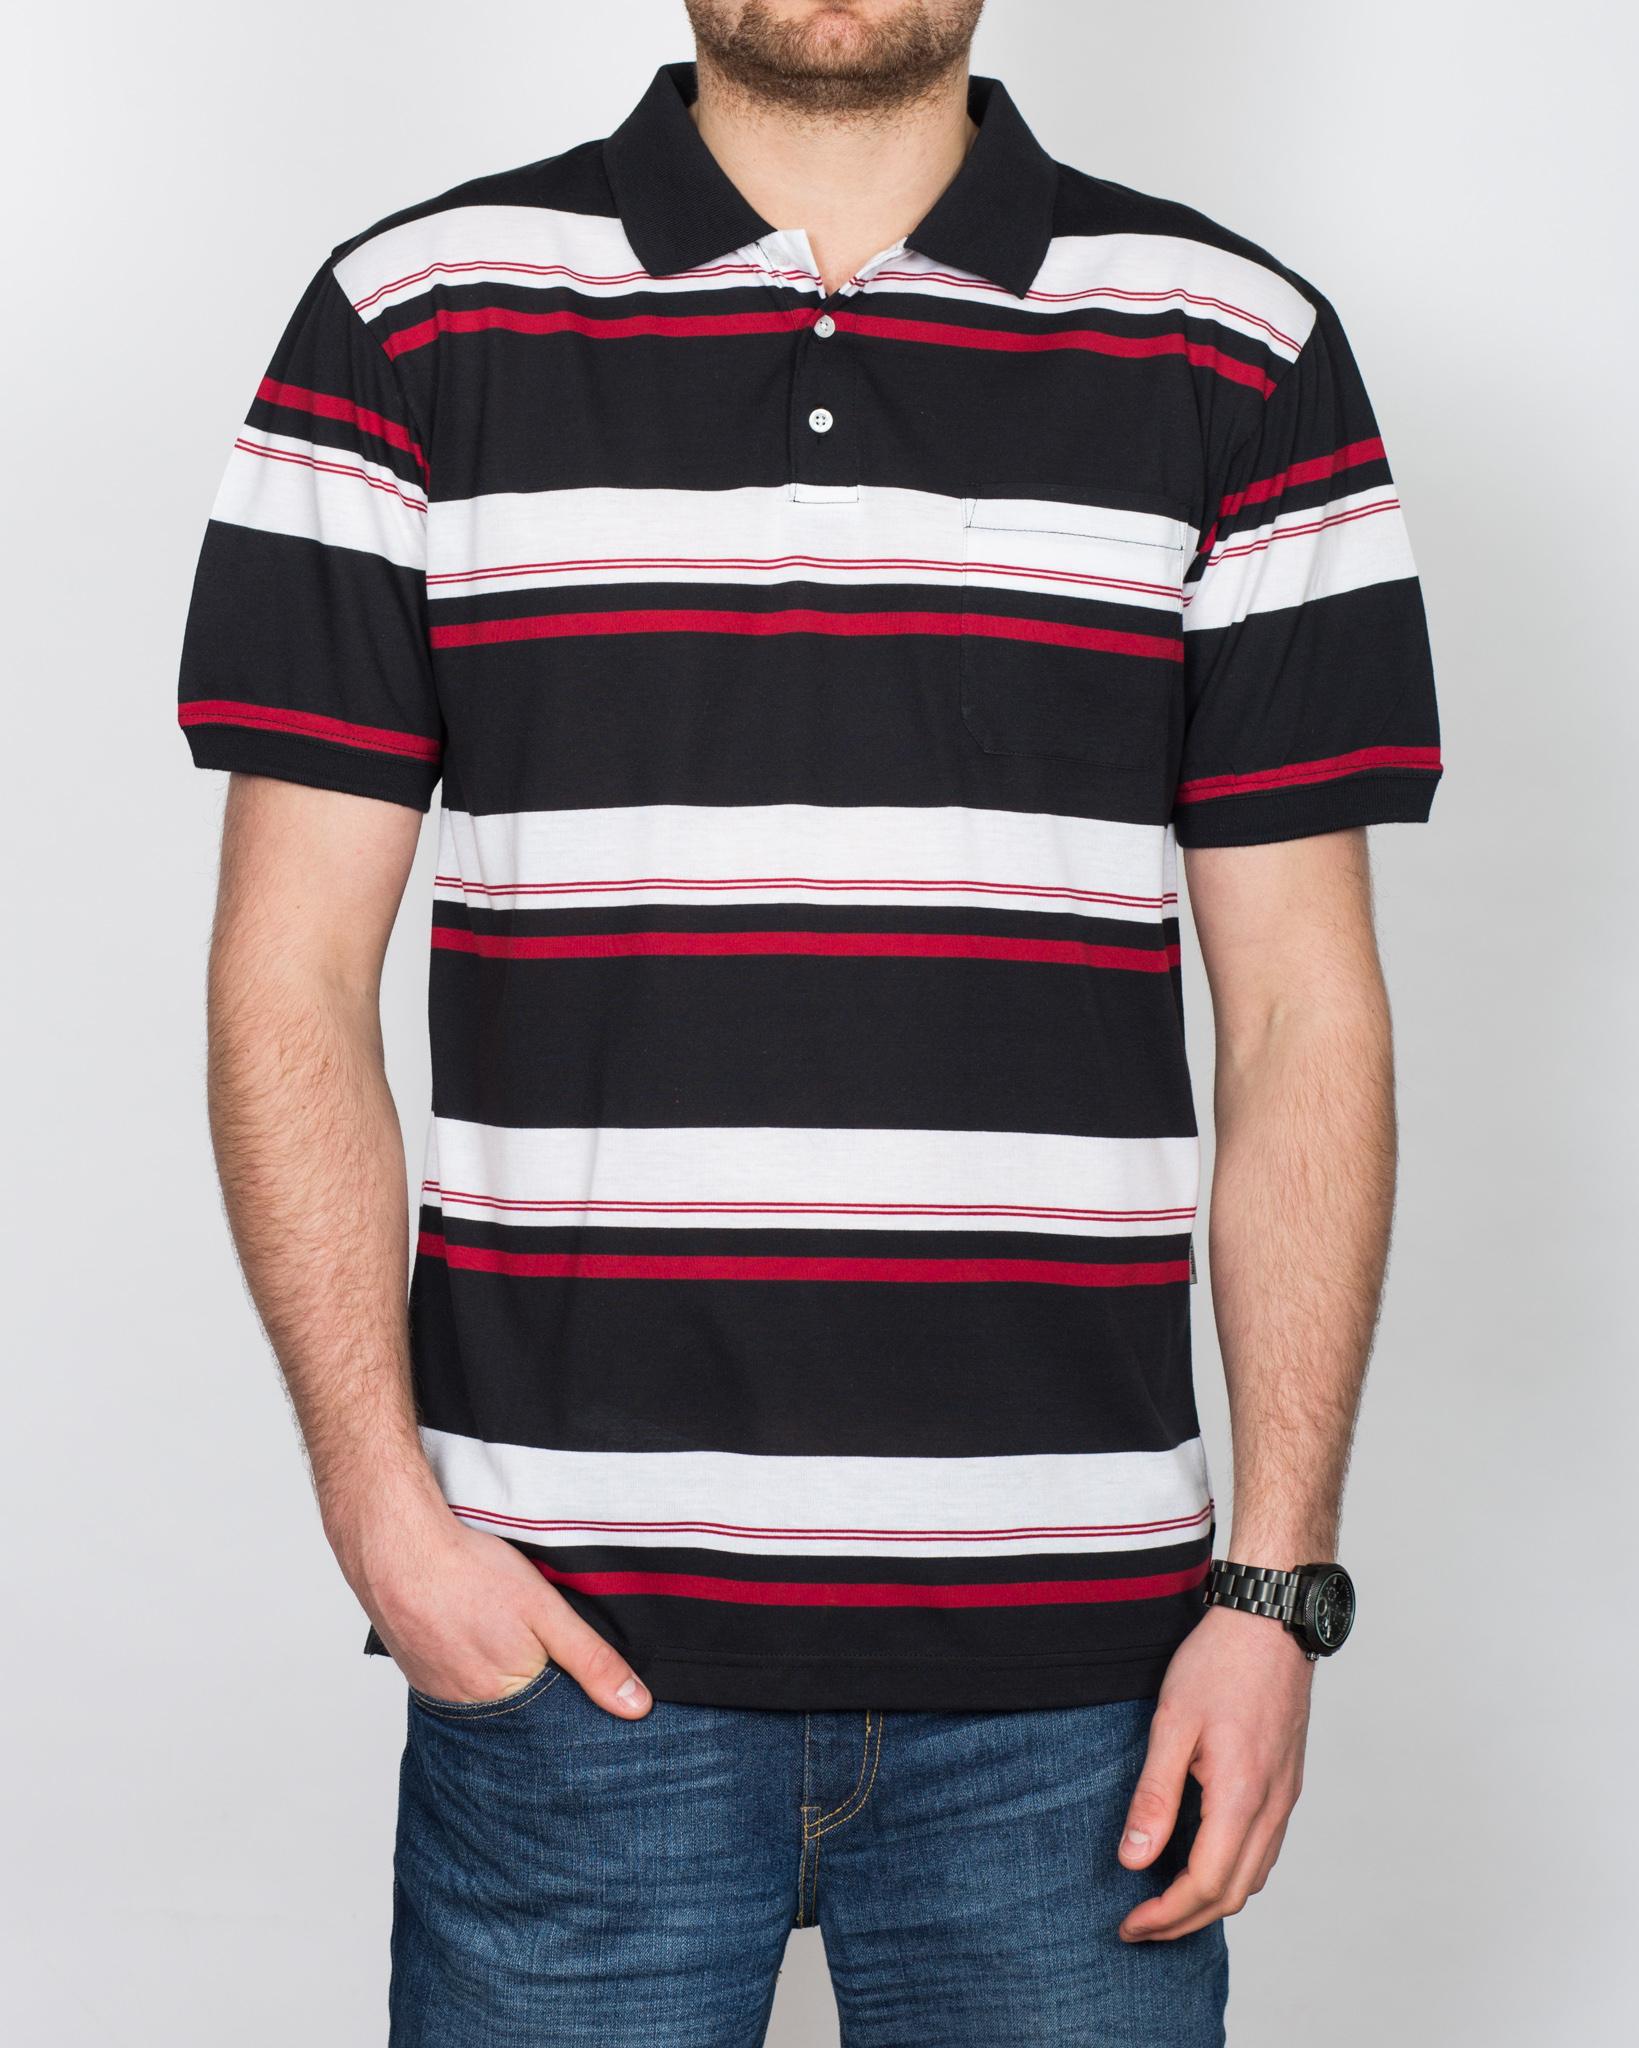 North 56 Striped Tall Polo Shirt (black)